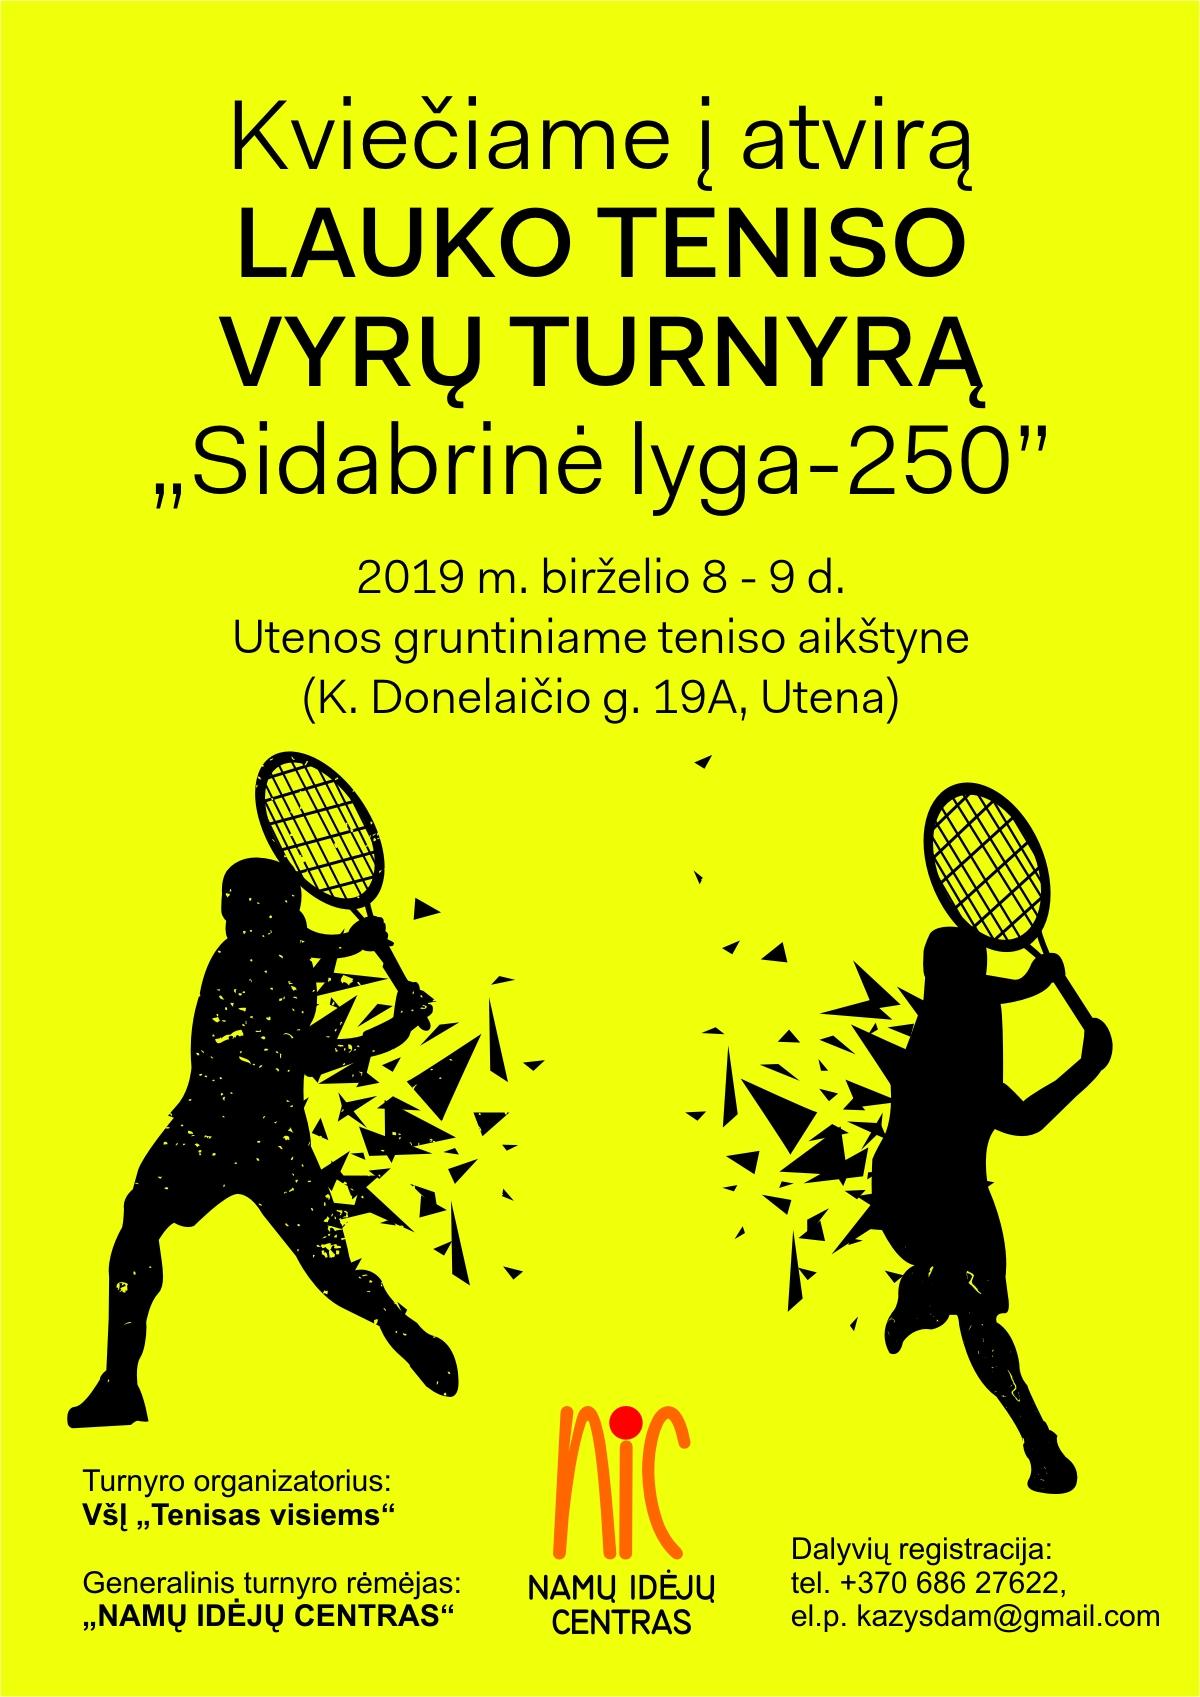 tenisas visiems